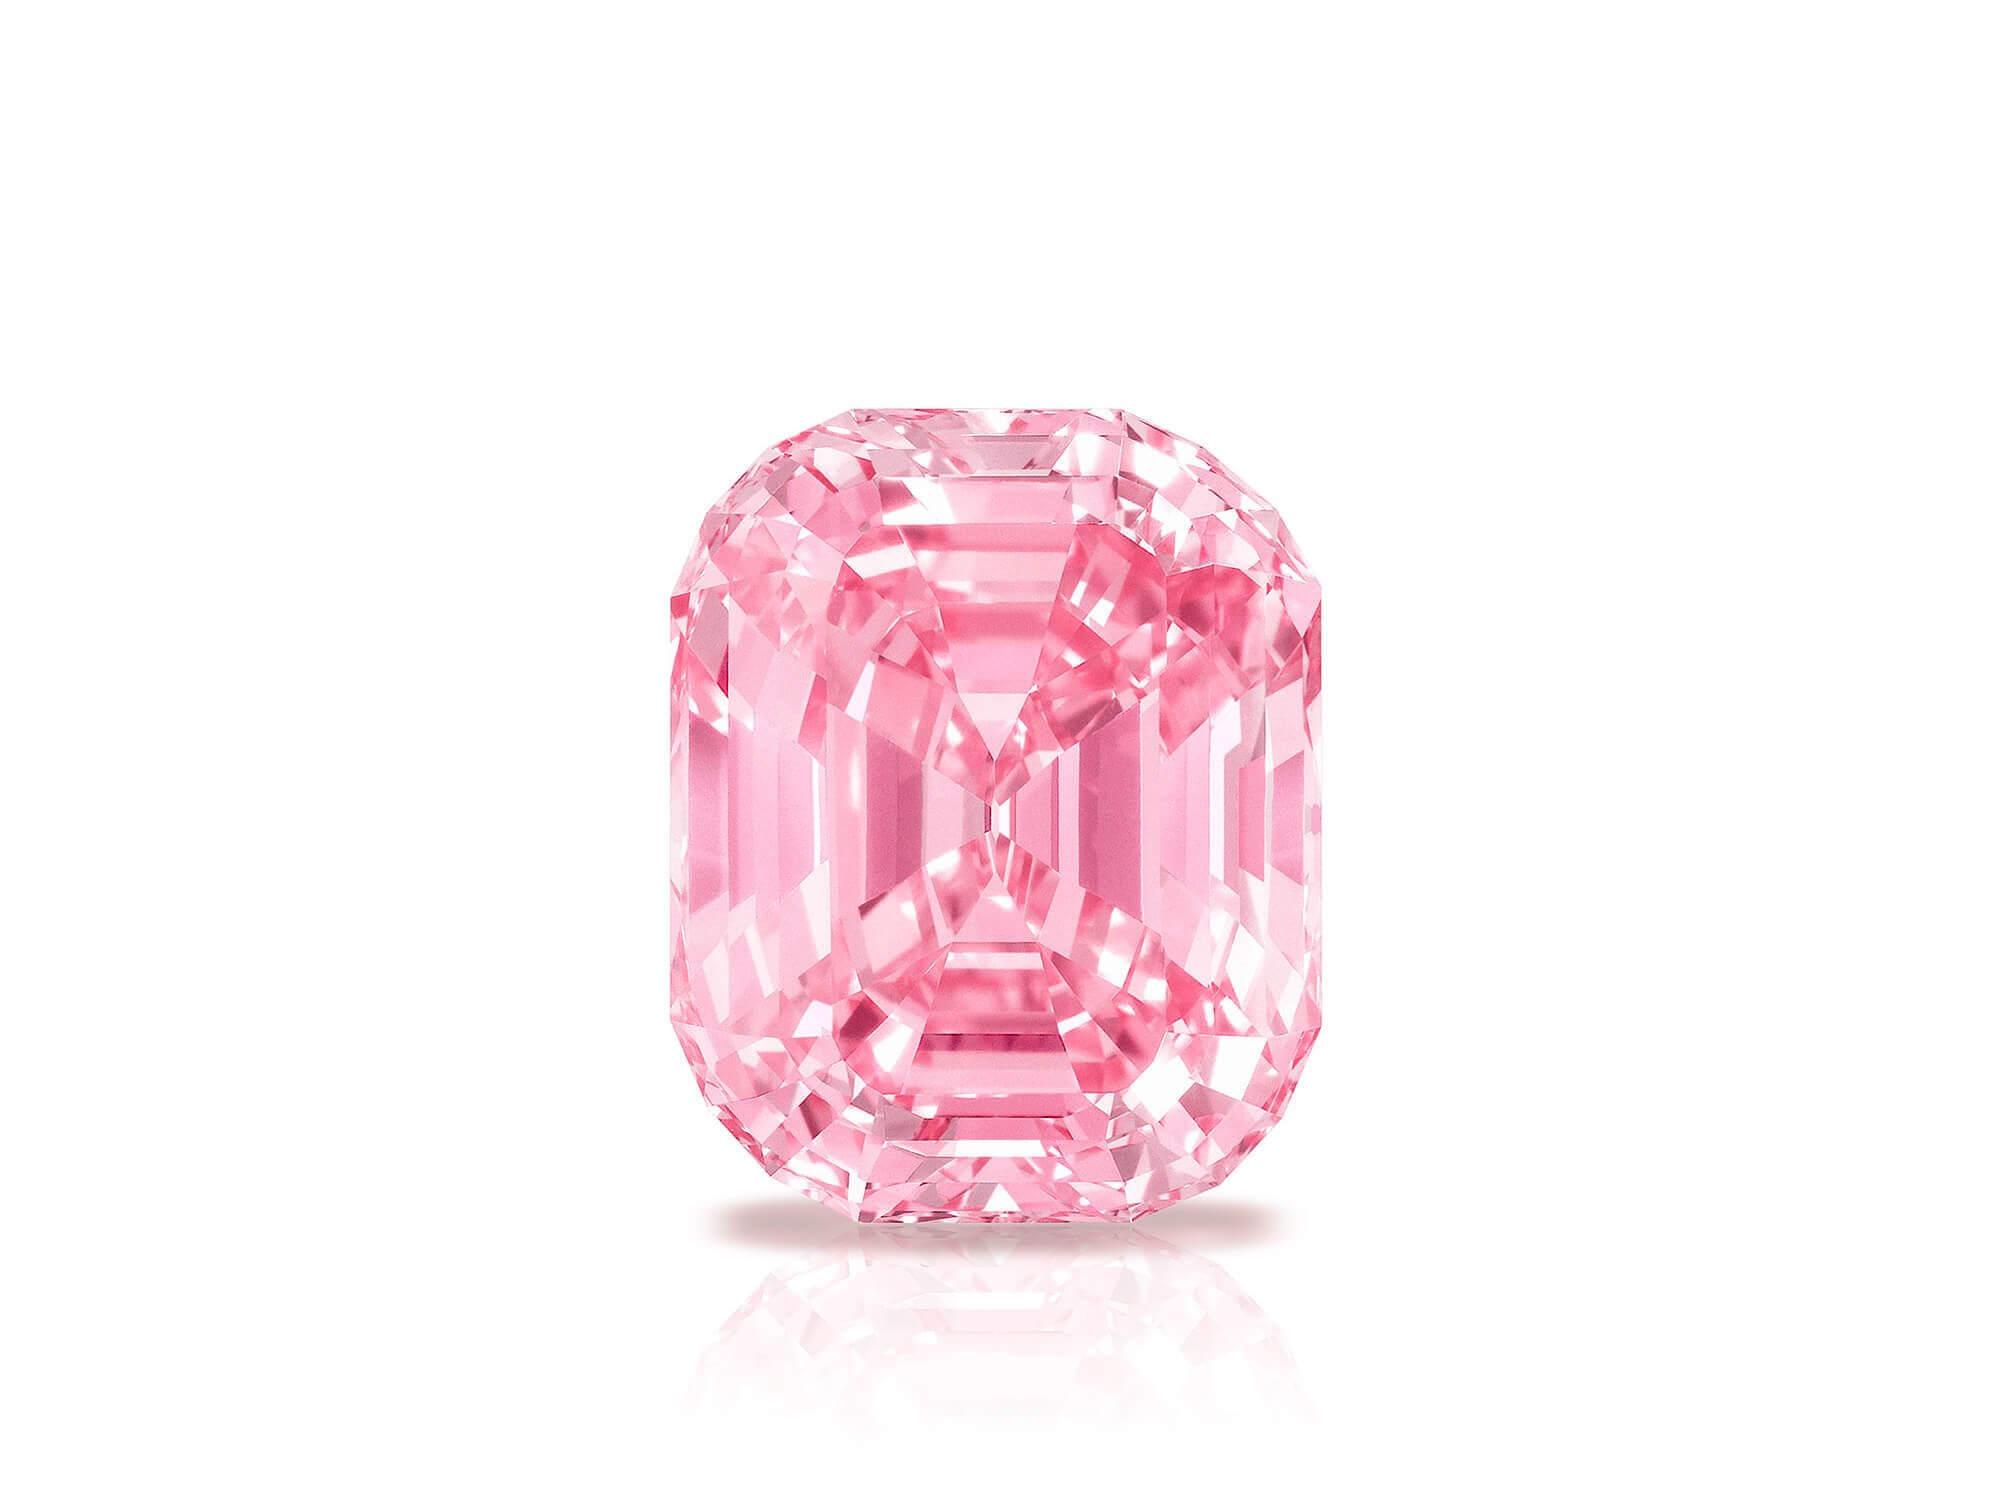 Graff-Diamonds-Rarity-The-Graff-Pink-4-2000x1485.jpg